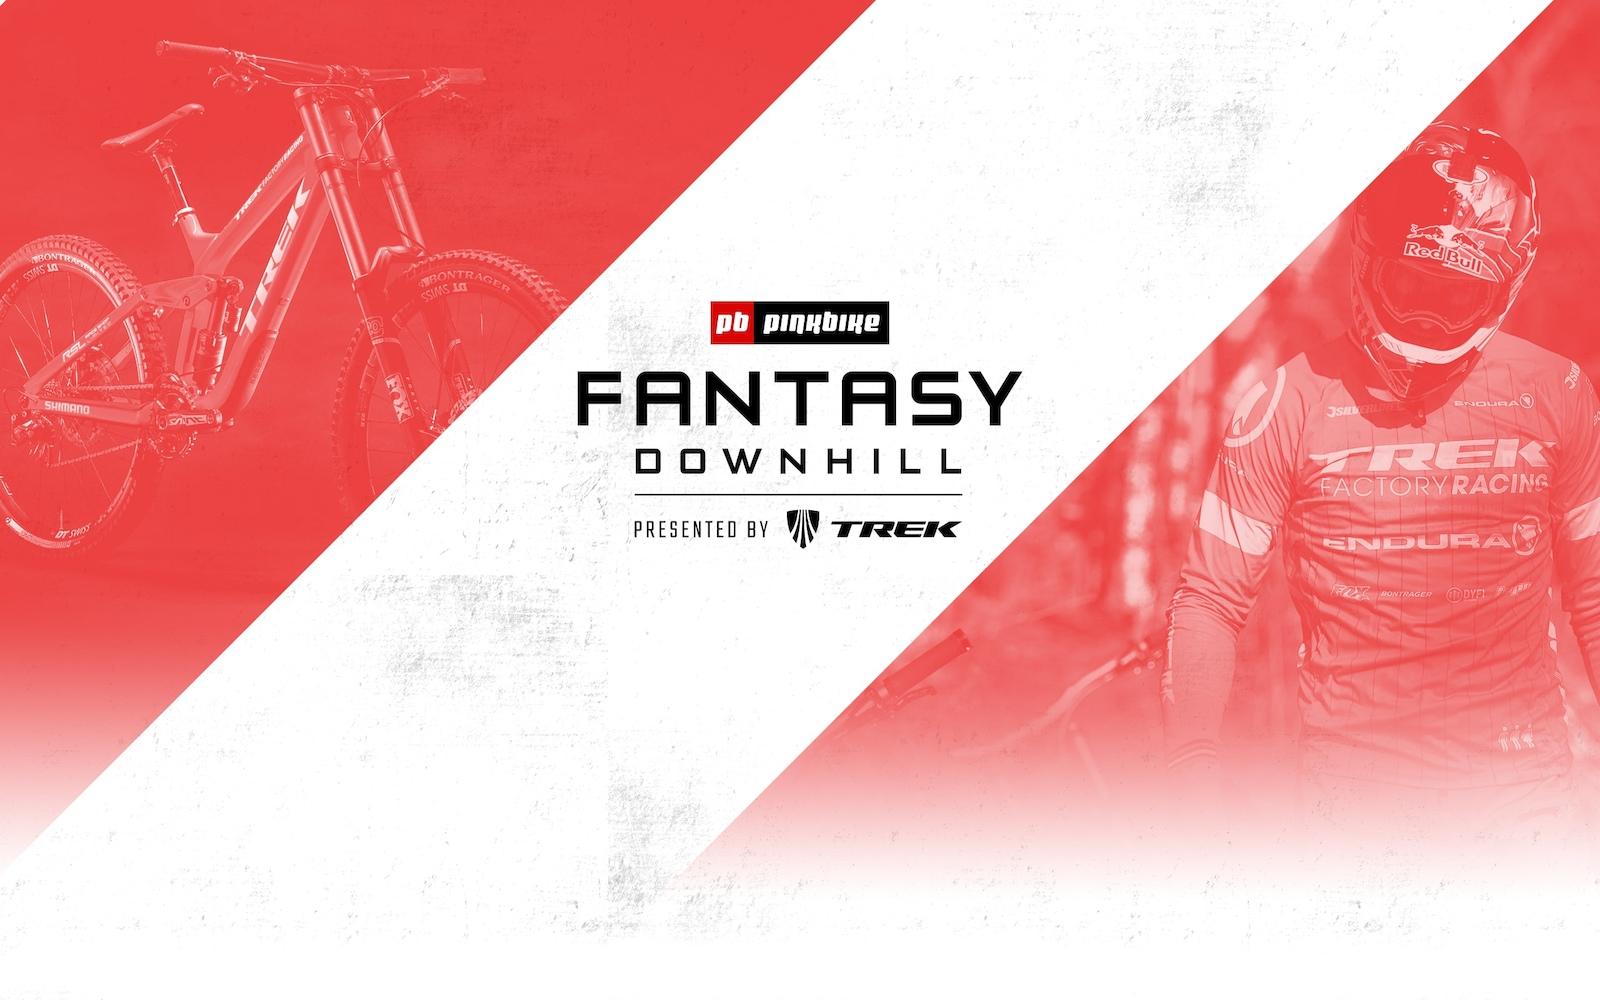 Pinkbike s DH Fantasy League Fantasy Downhill Presented by trekbikes